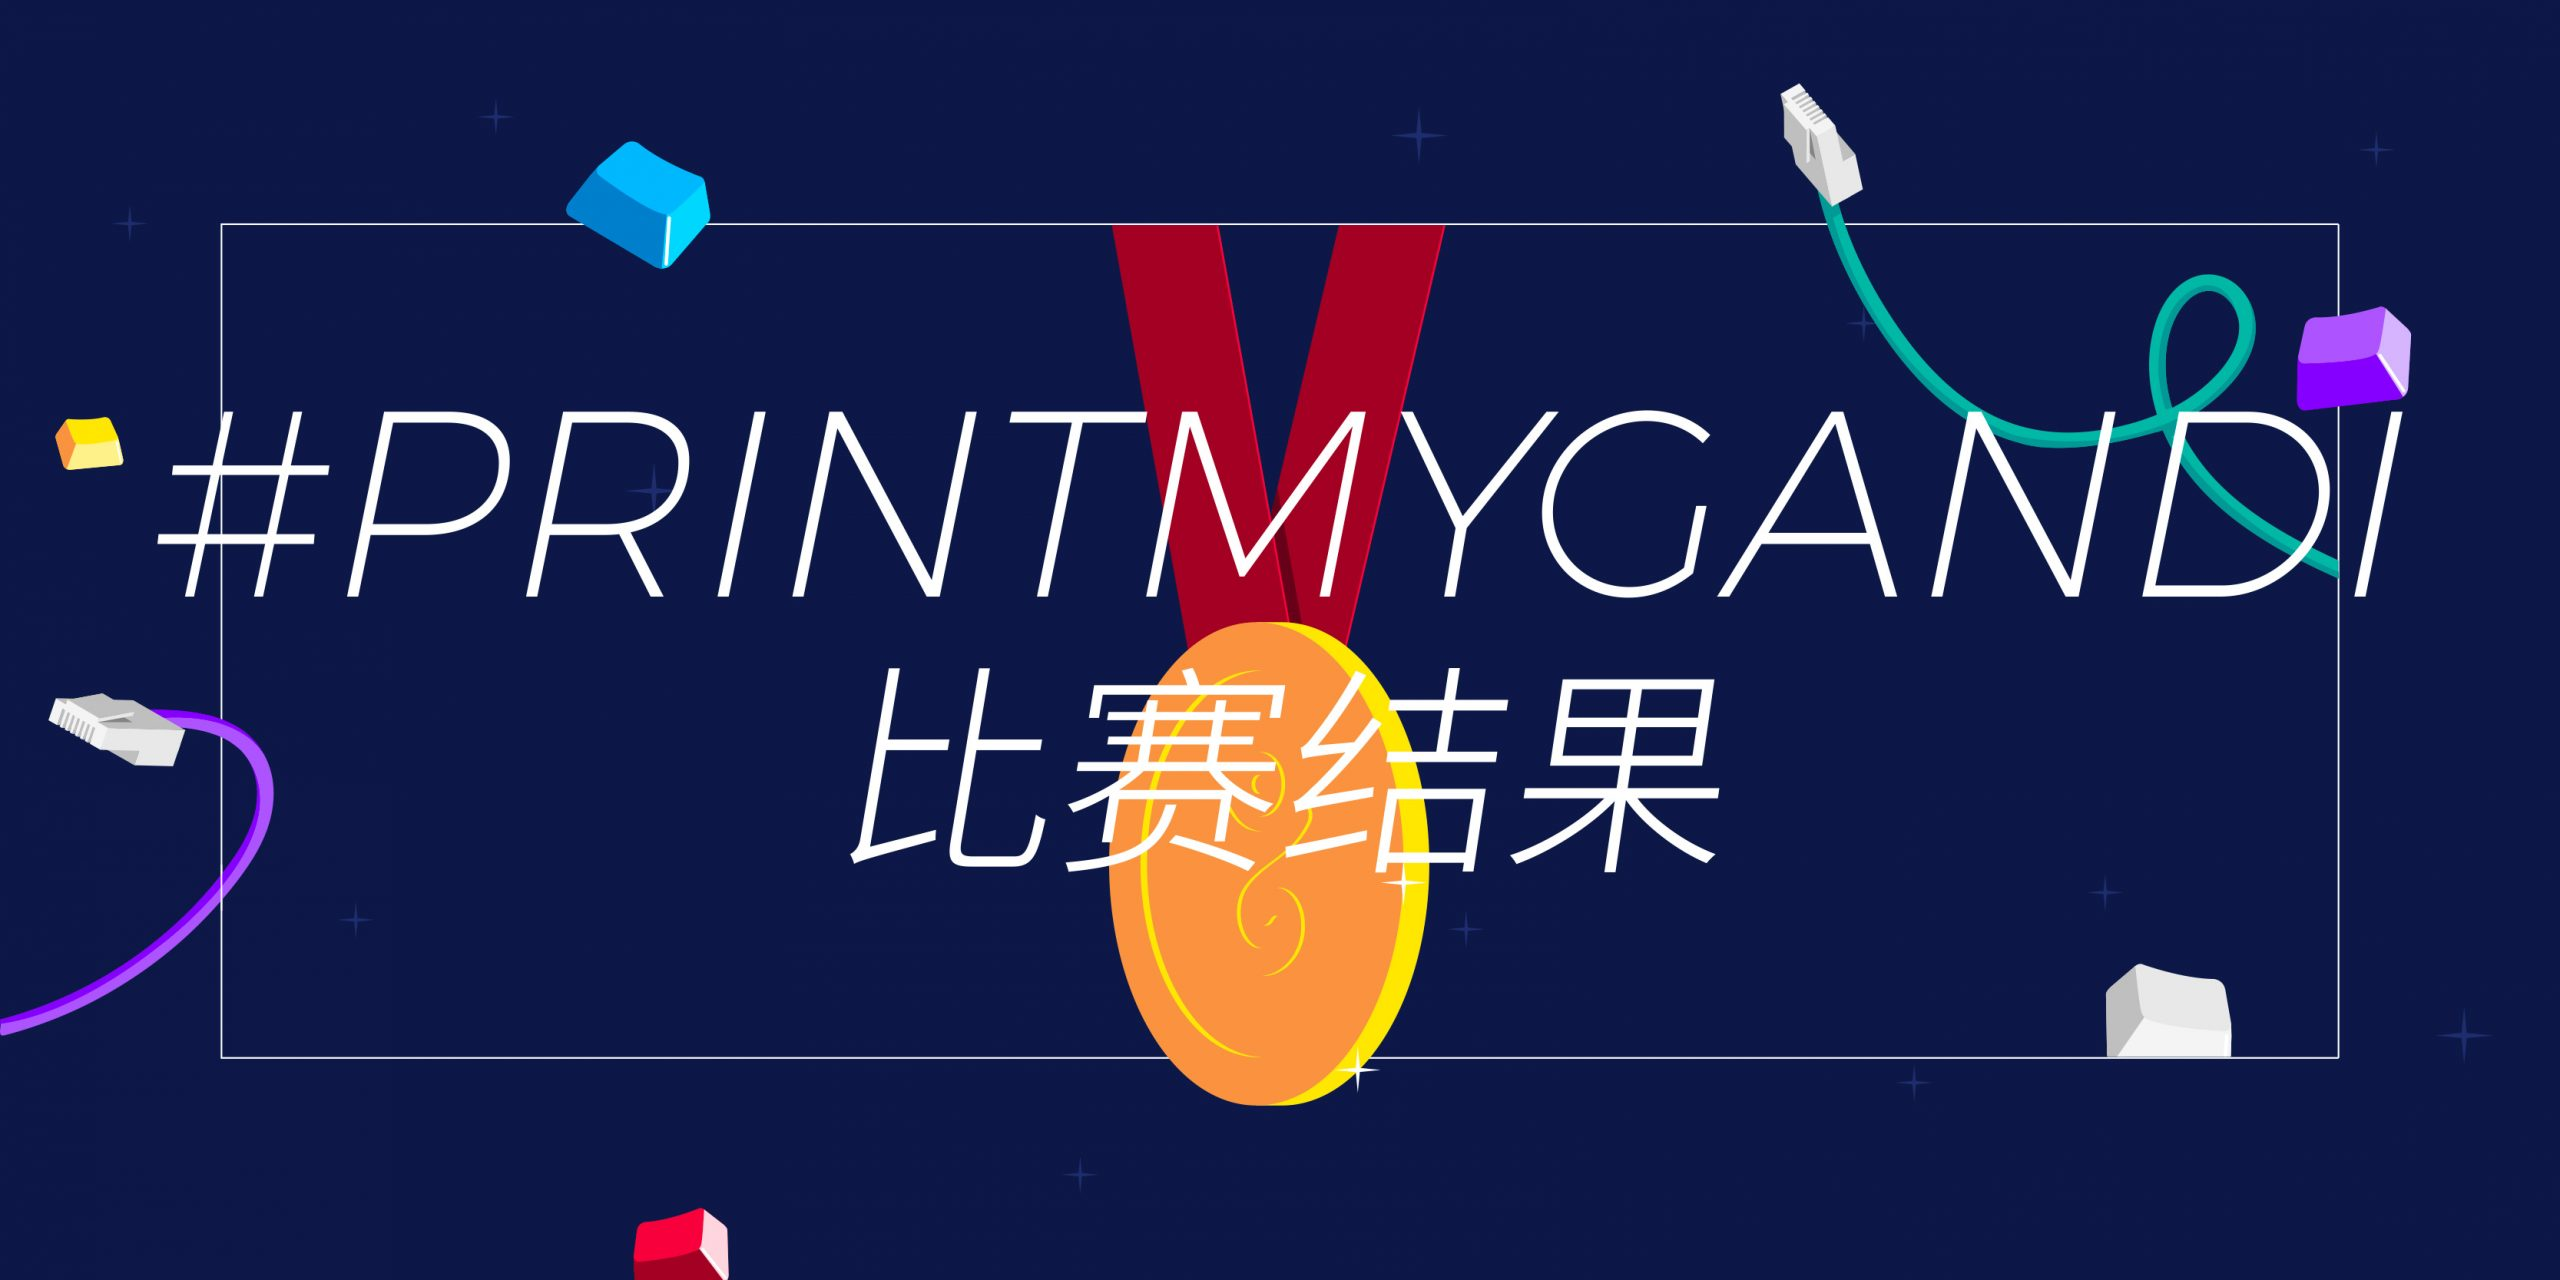 #PrintMyGandi T-shirt 设计竞赛的大赢家们